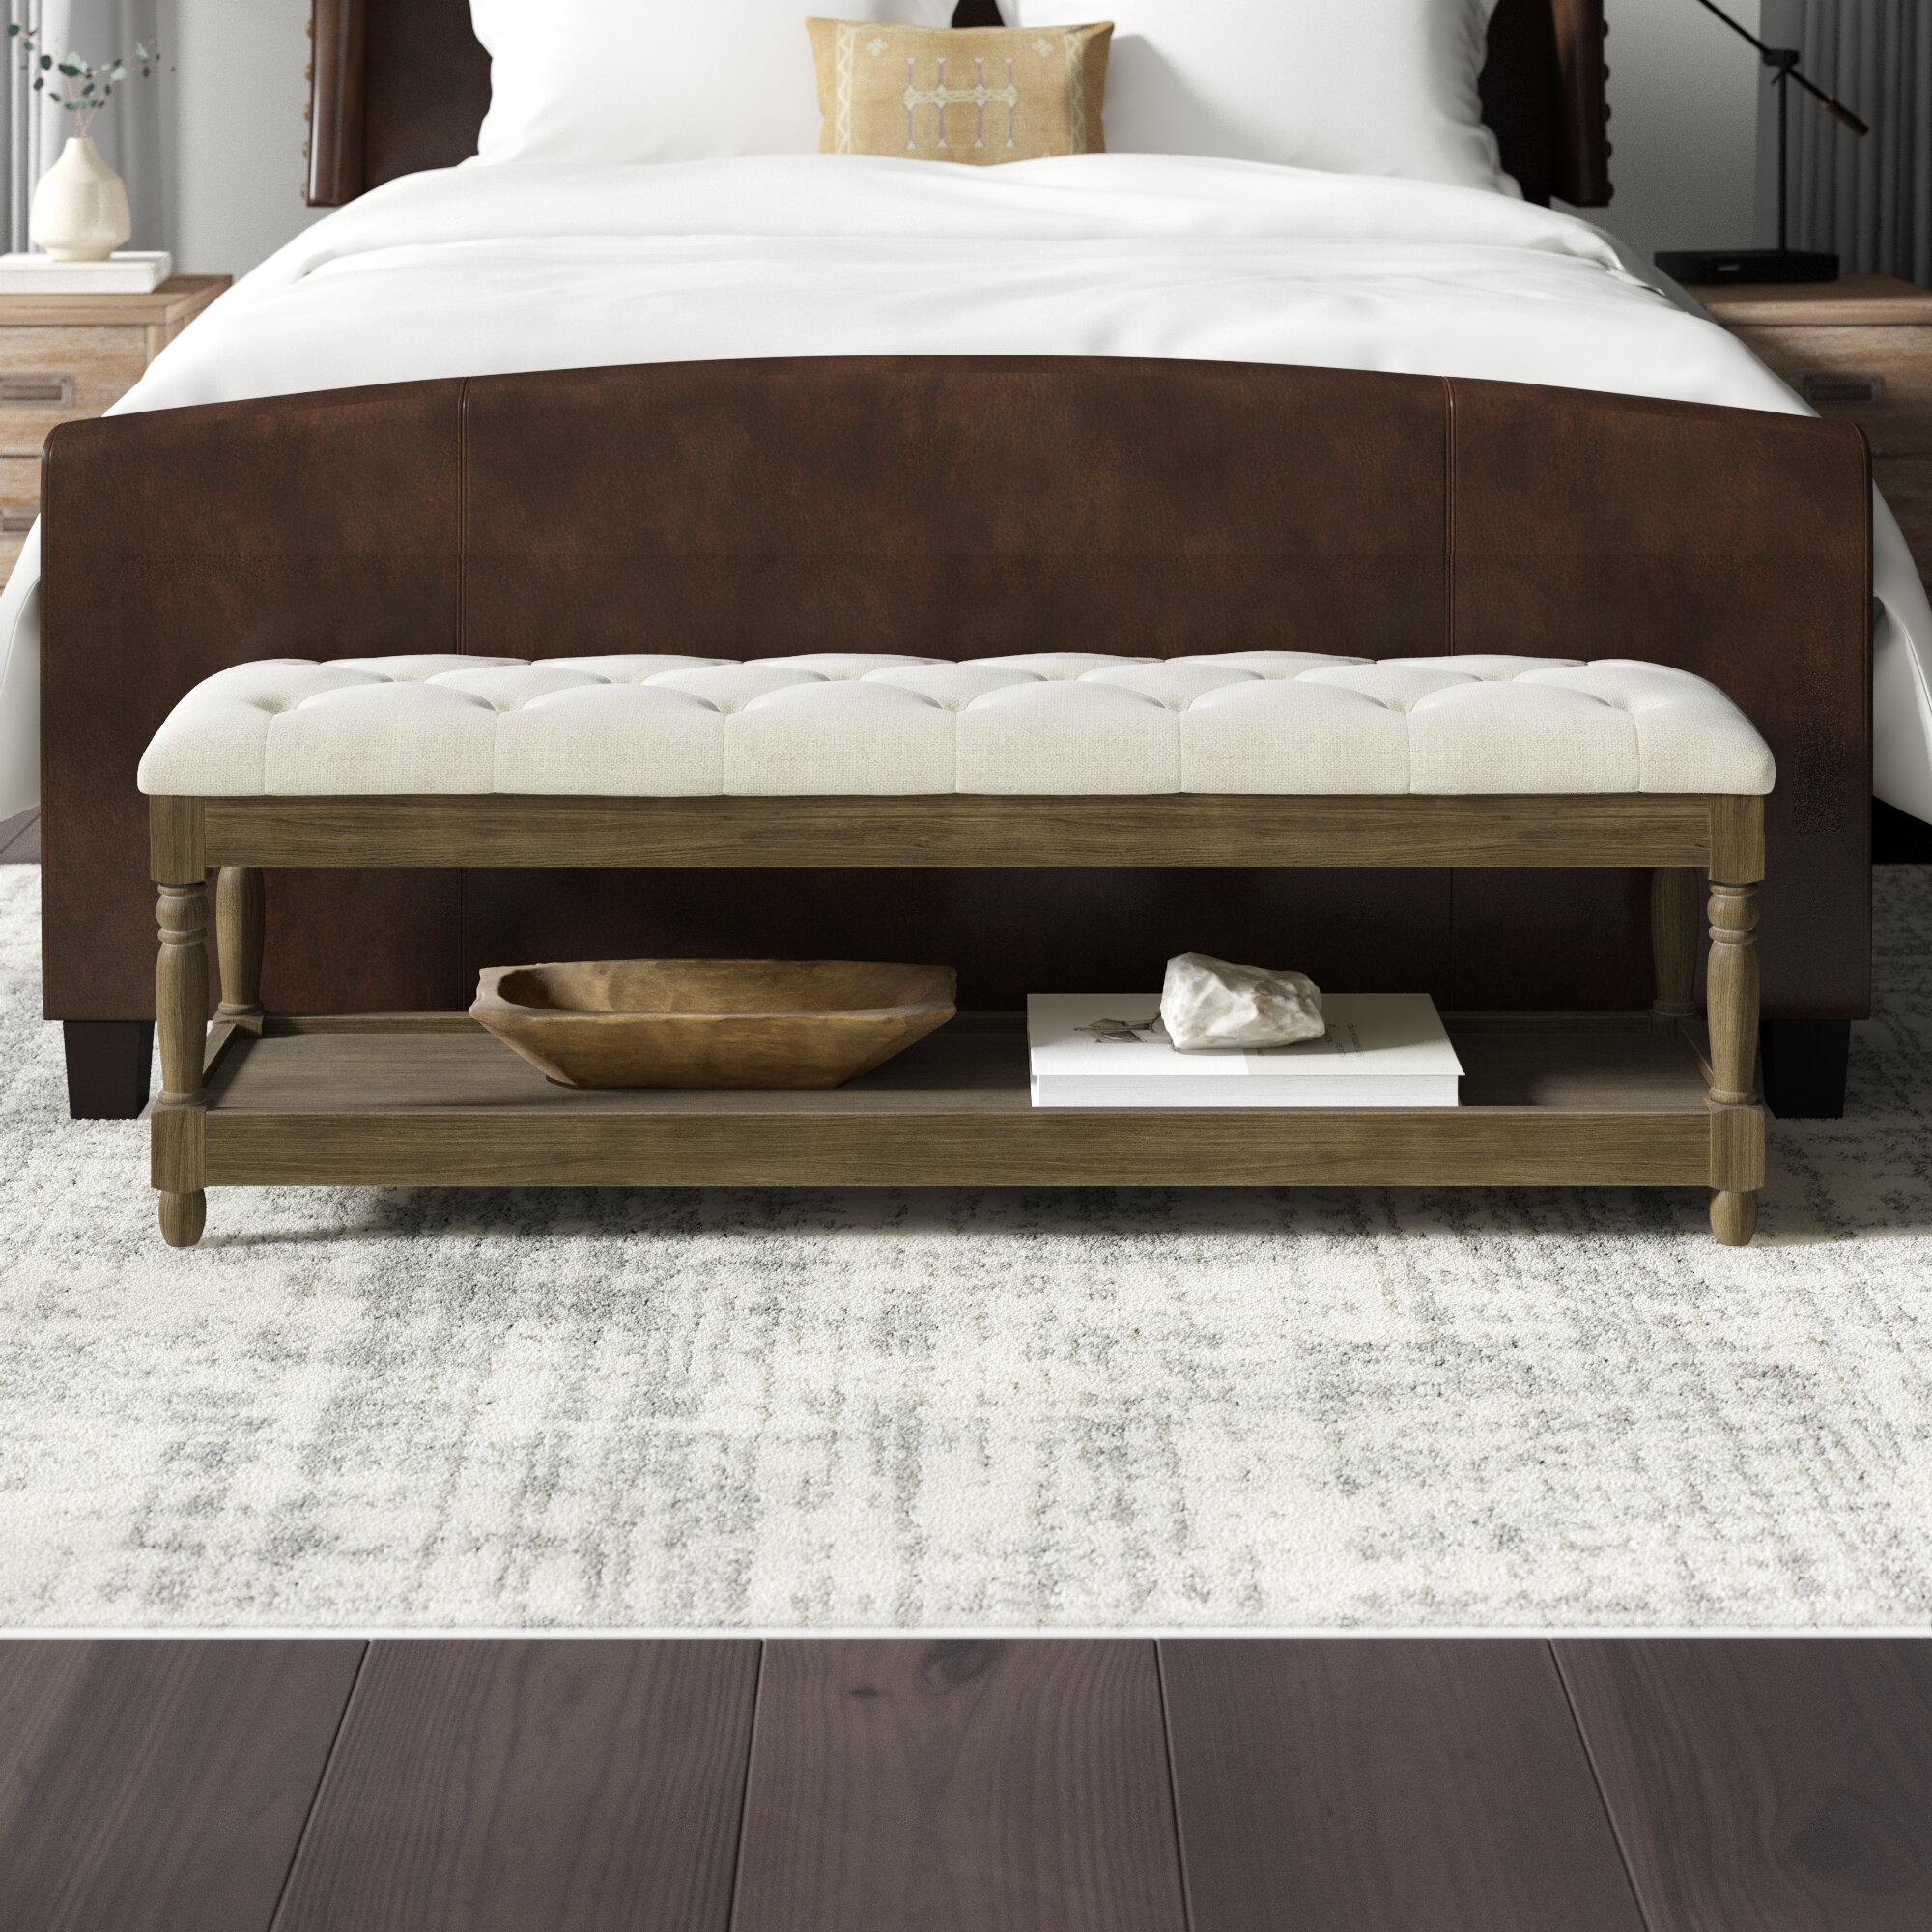 Greyleigh Brodnax Upholstered Storage Bench Reviews Wayfair